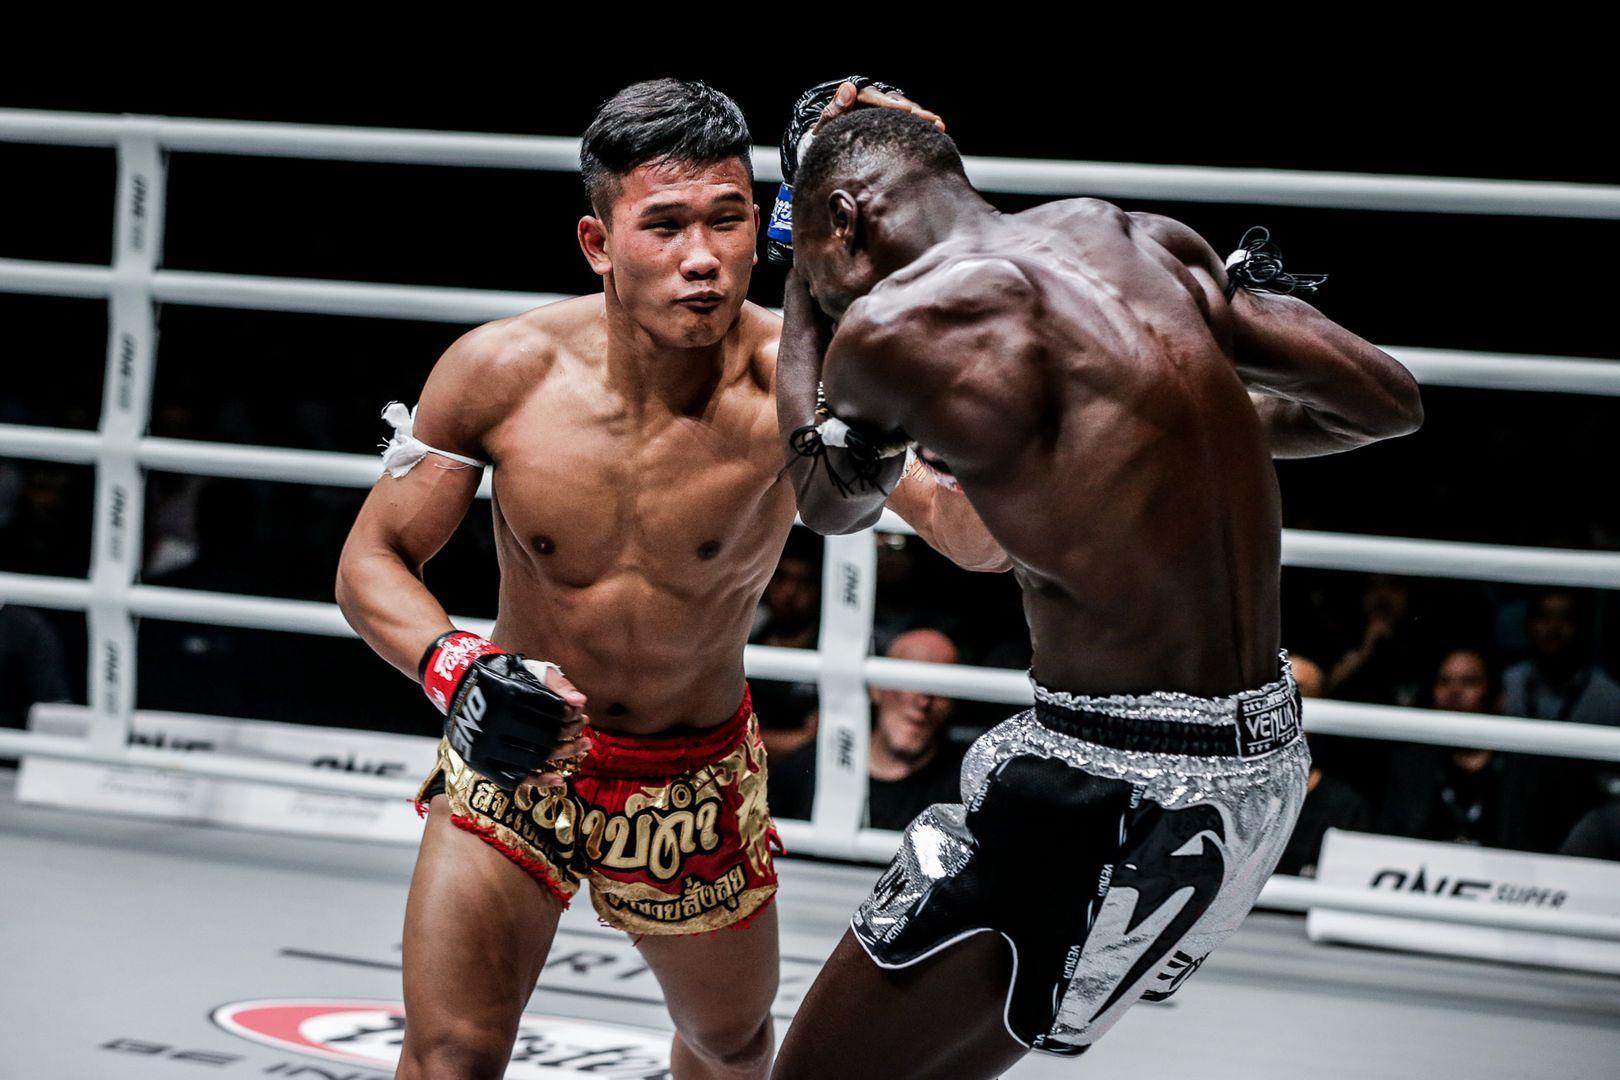 Muay Thai fighter Kulabdam Sor Jor. Piek Uthai beats Bobo Sacko